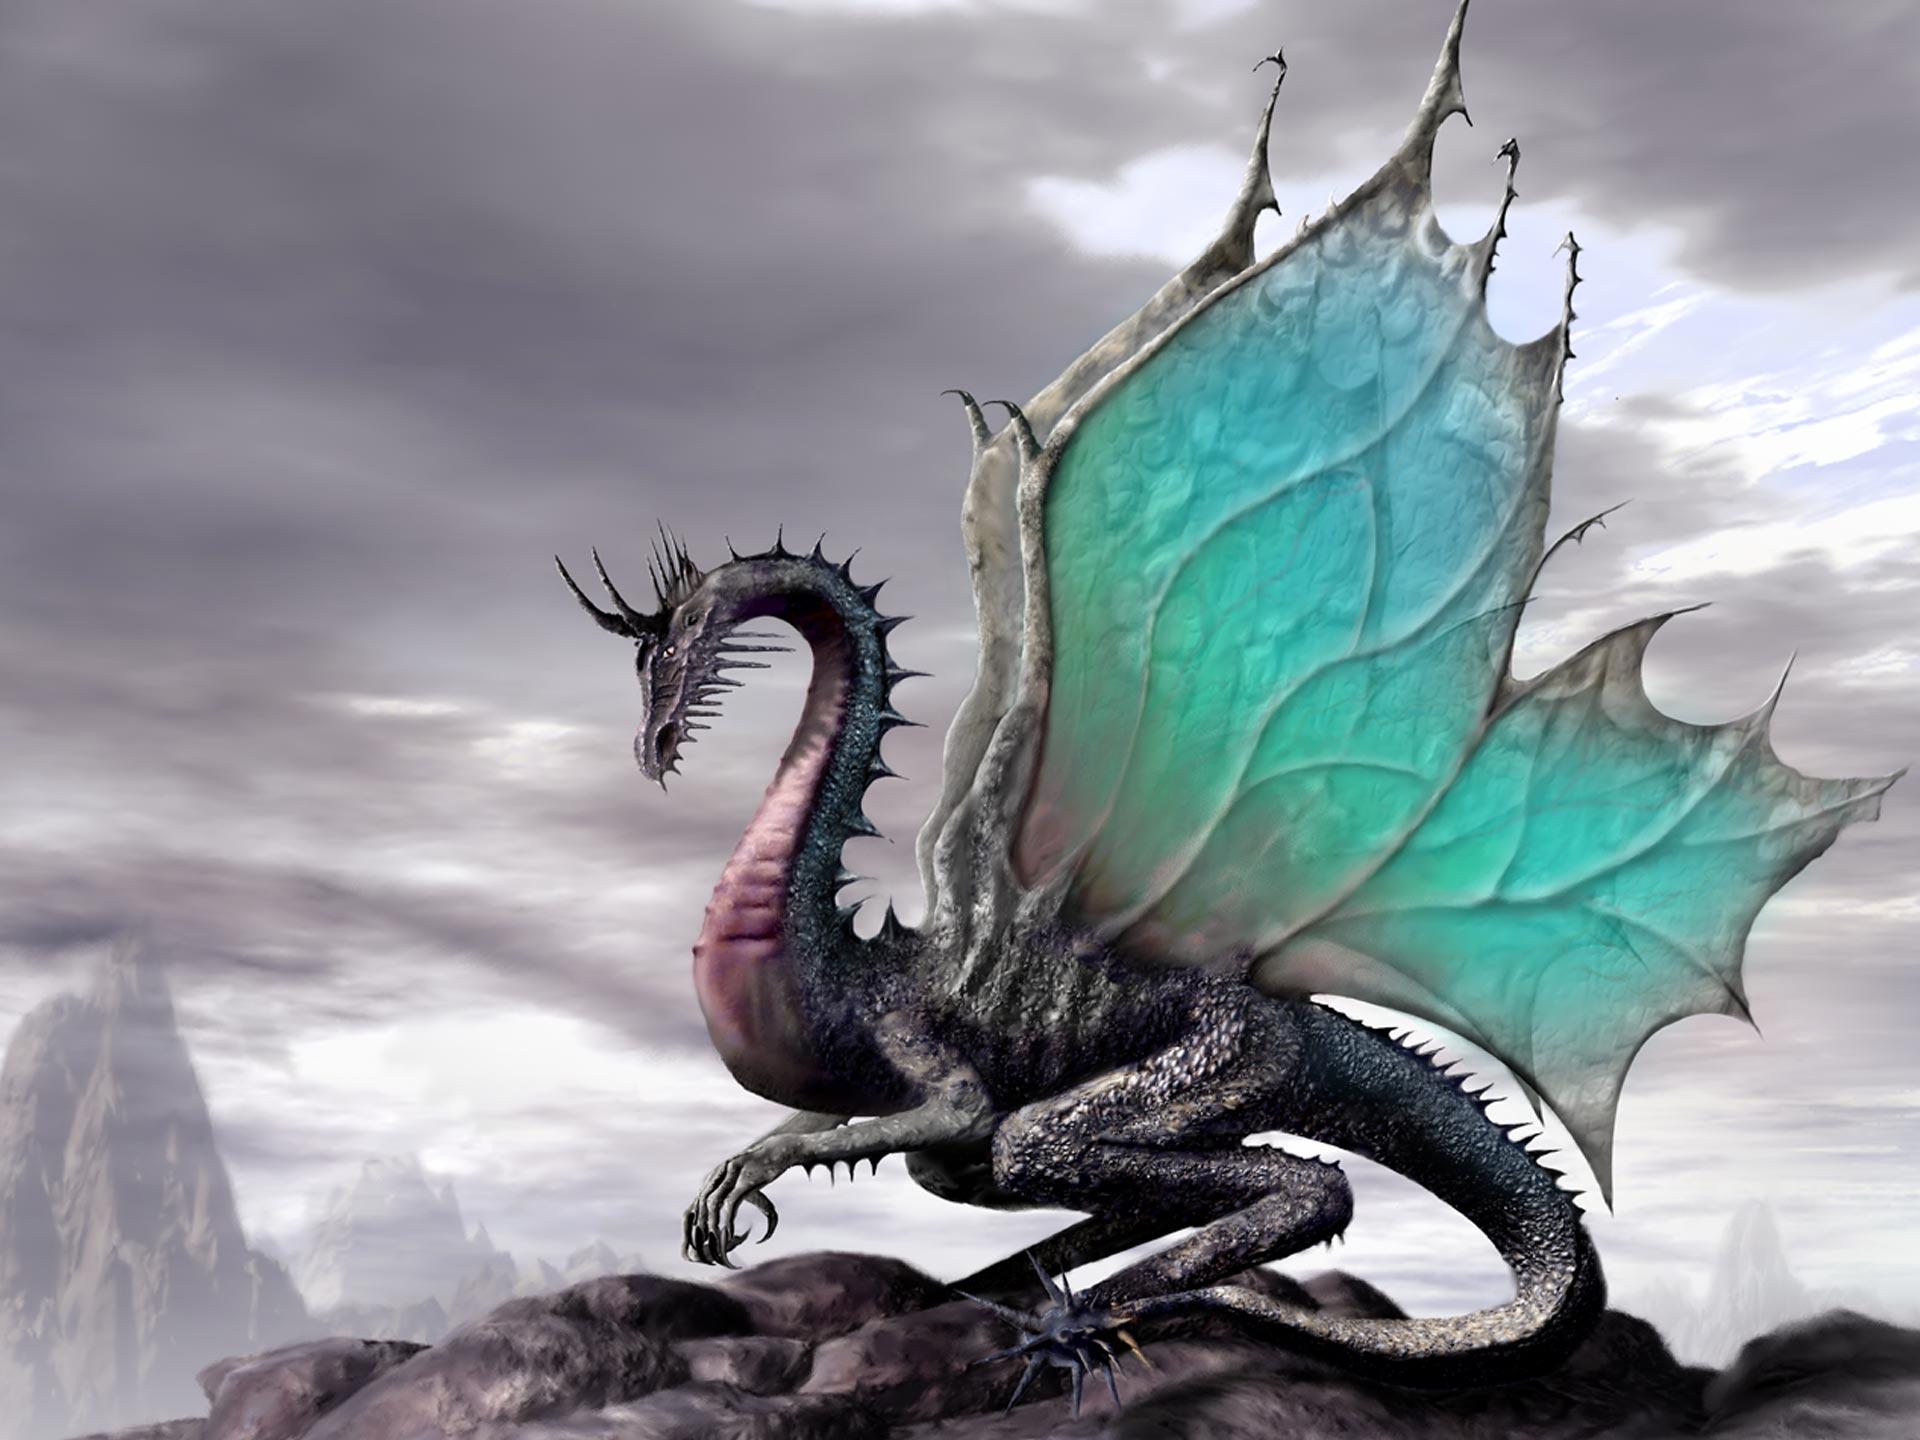 Desktop Wallpaper Gallery 3D Art Ancient Dragon 1920x1440